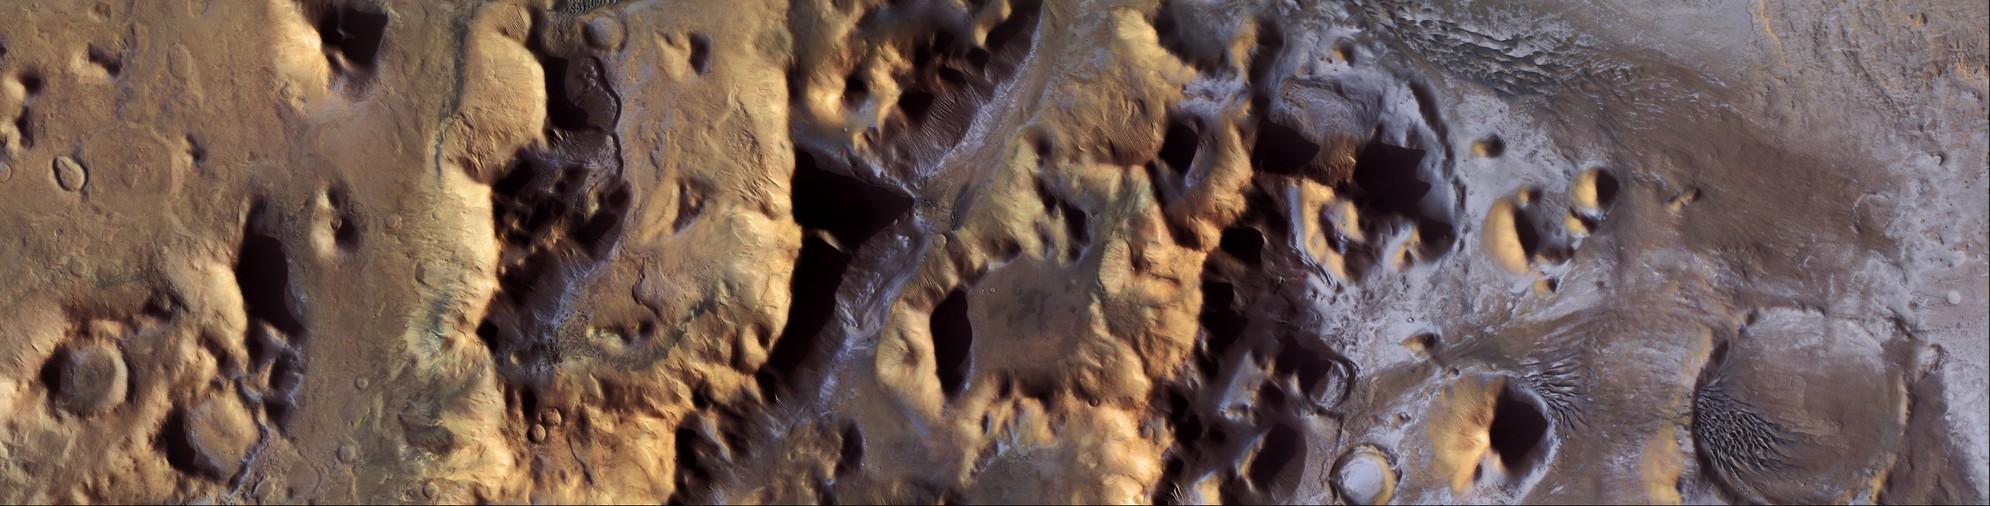 Mars Express - 20160126 HRSC Orbit C839